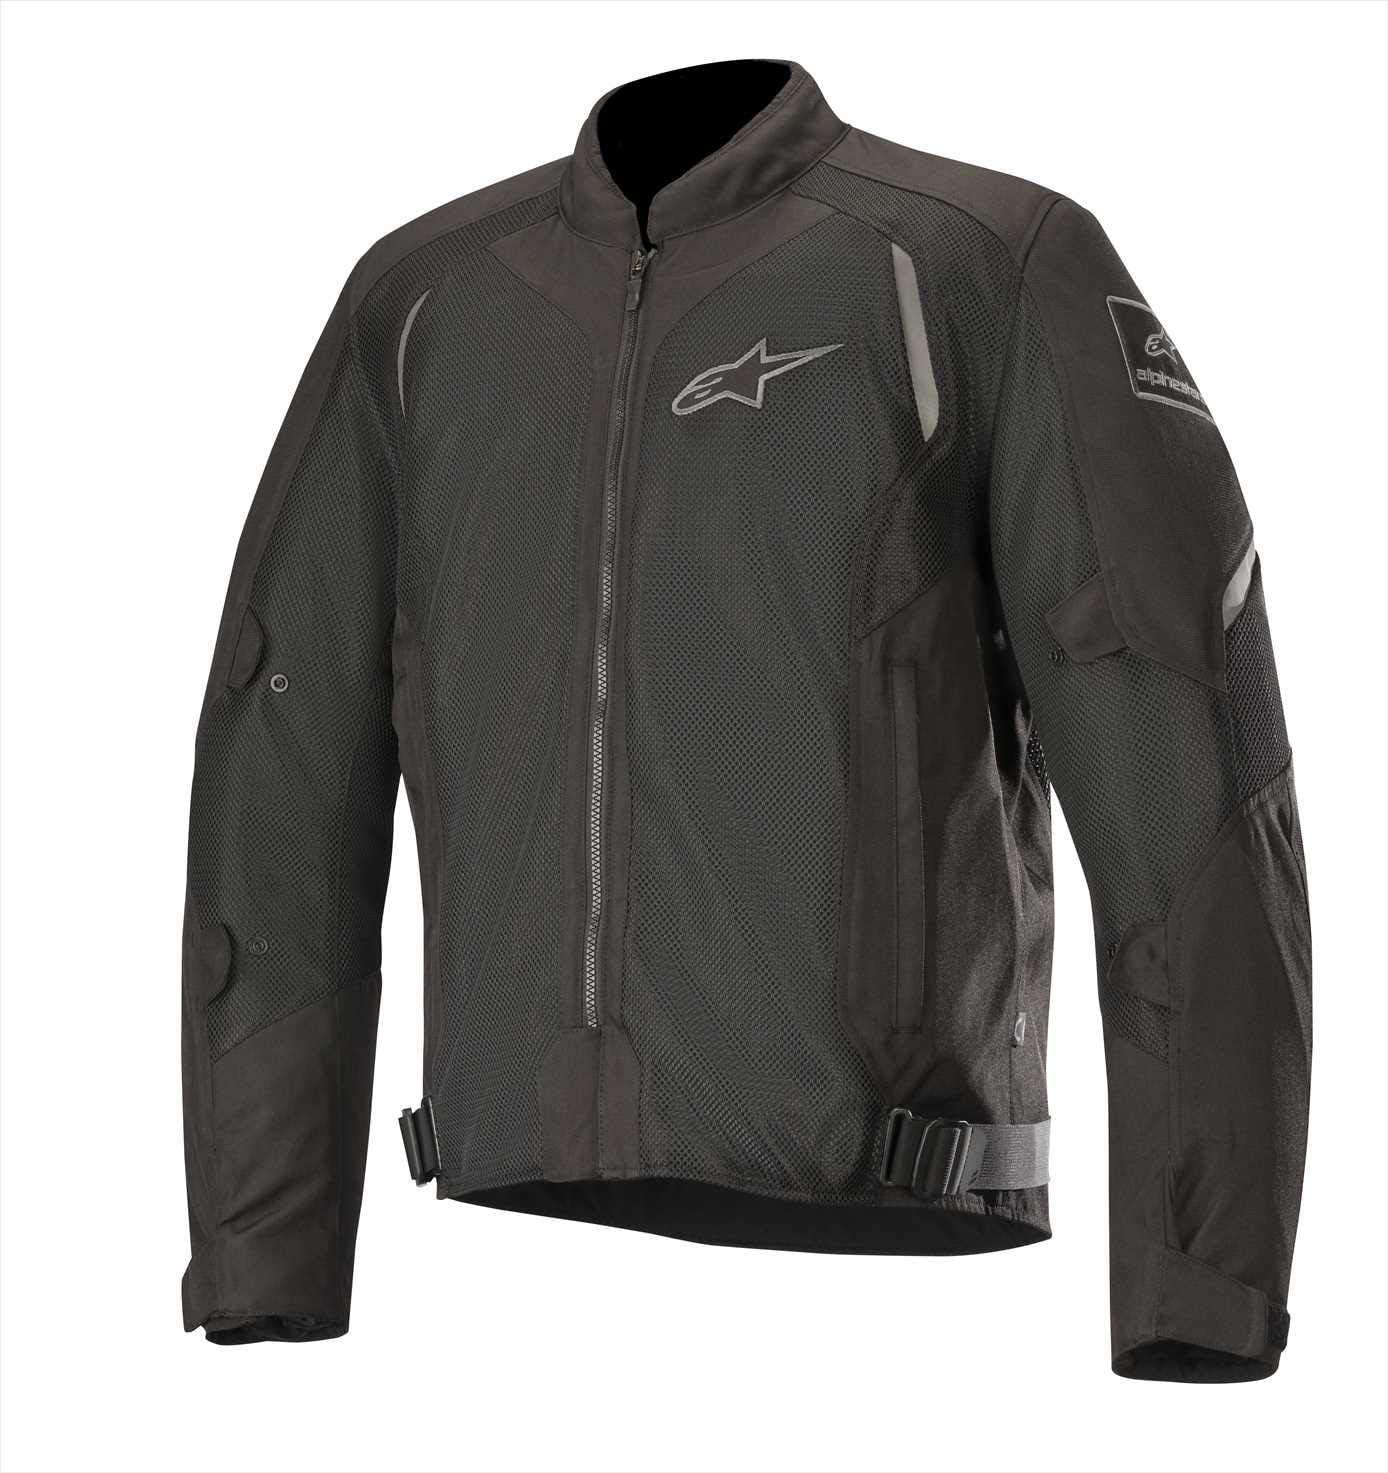 Alpinestars Wake Air Budget Motorcycle Jacket